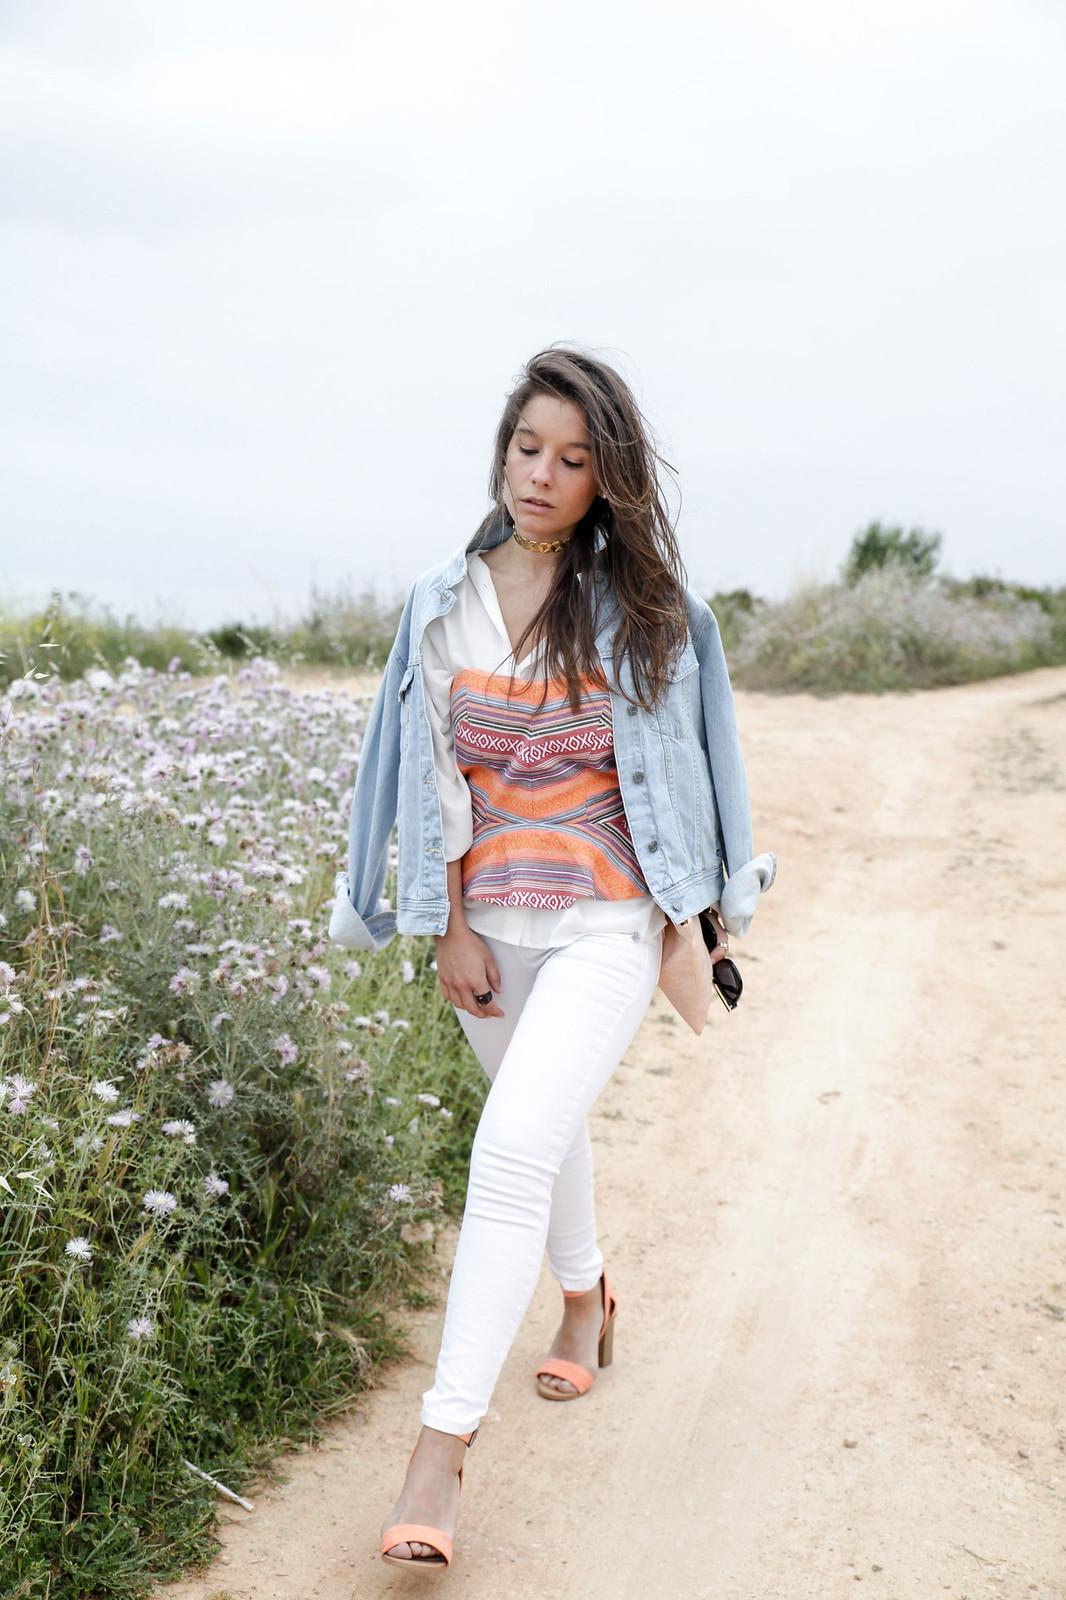 05_corset_etnico_danity_paris_theguestgirl_influencer_barcelona_laura_santolaria